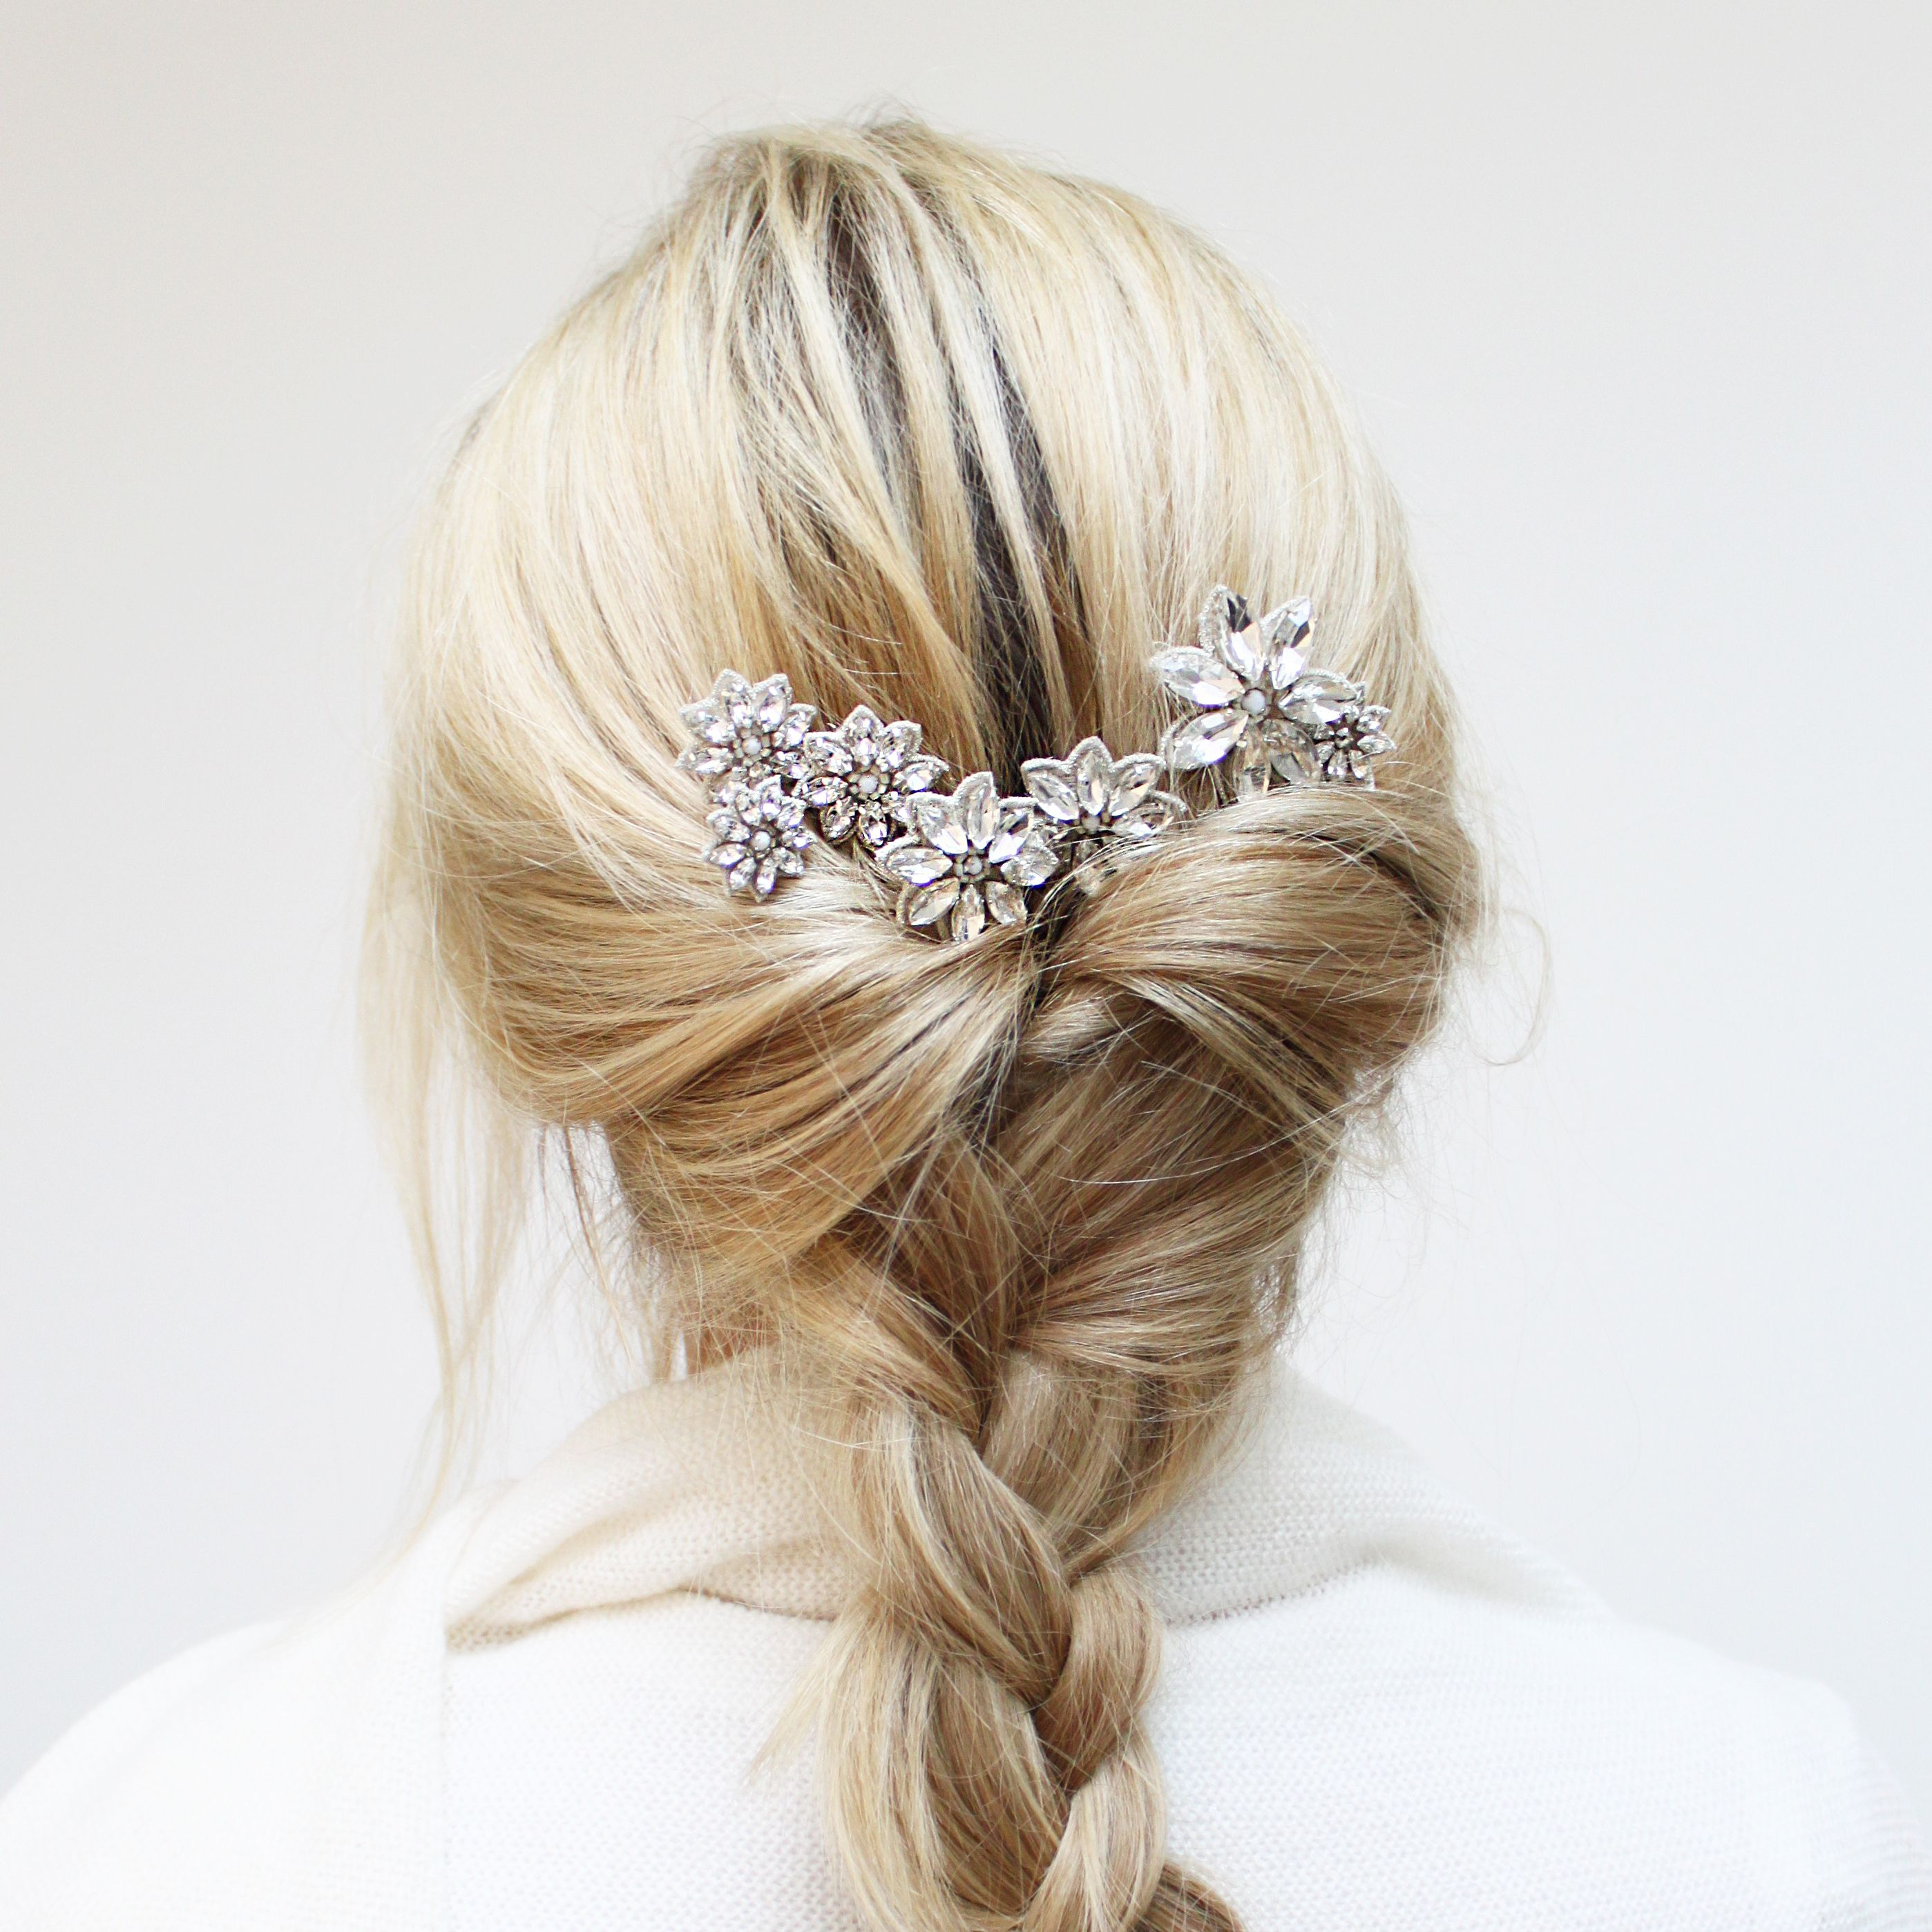 pin by emmy london on bridal styling | emmy london | pinterest